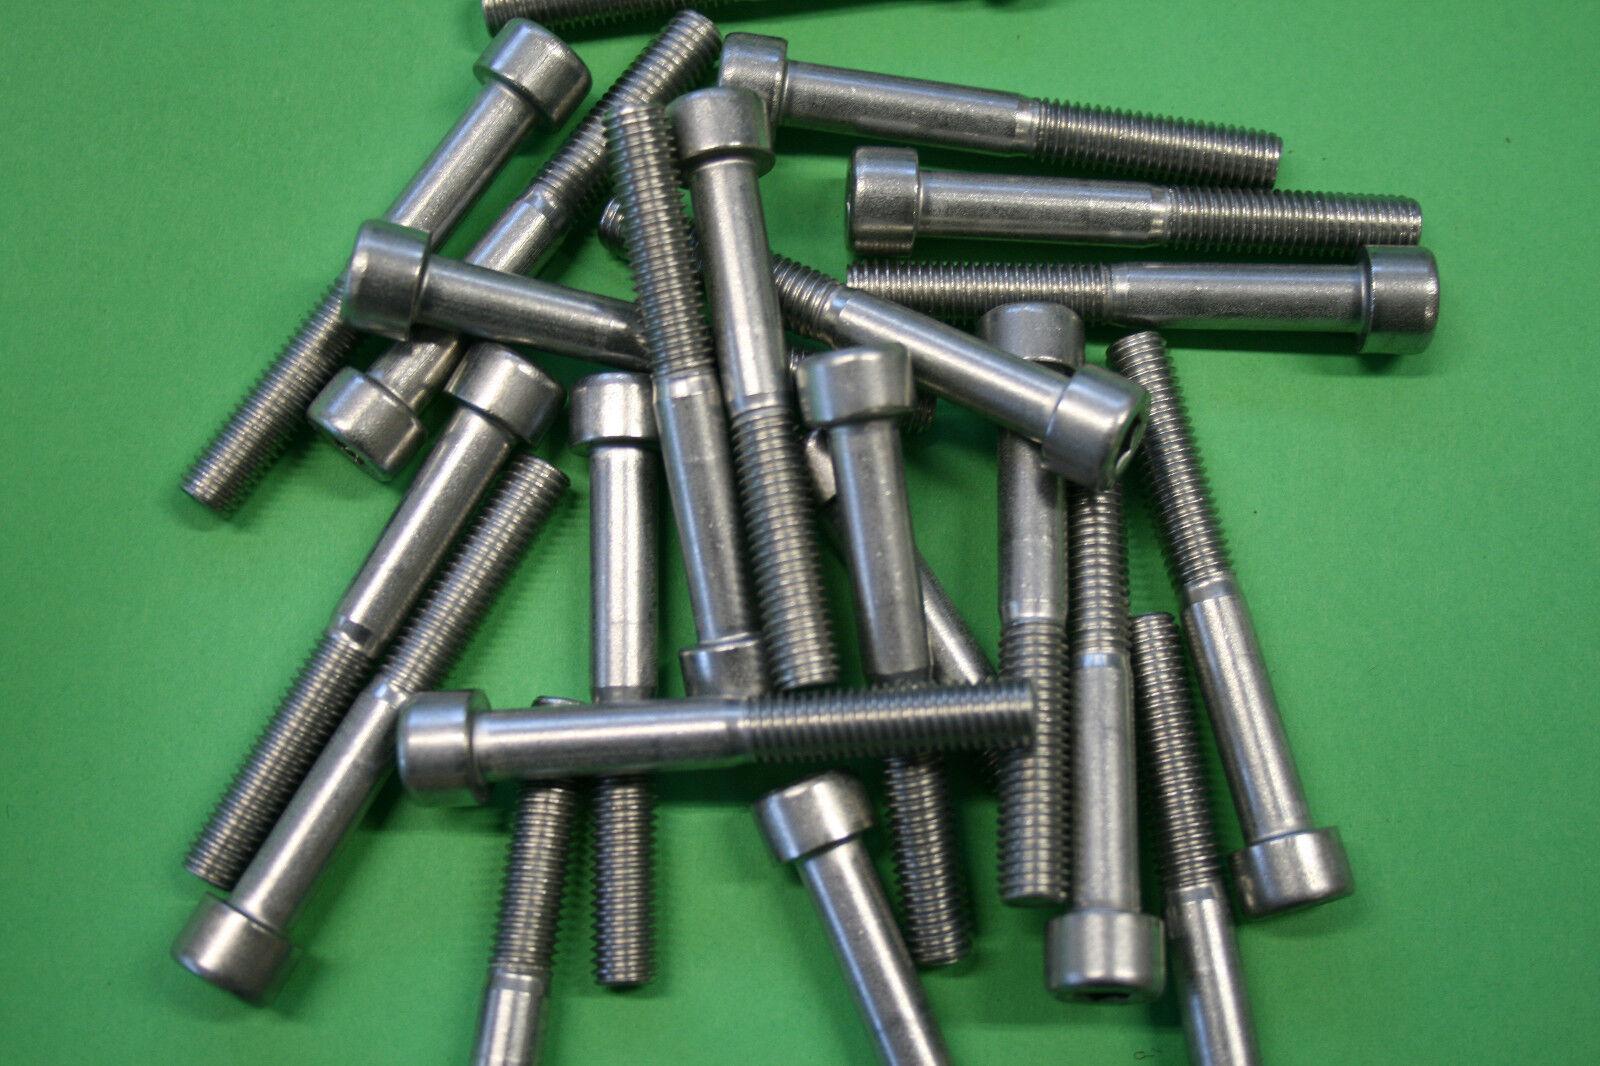 Gewindeschraube, Zylinderschrauben, M5 ,10-80mm, DIN 912 ,Edelstahl A2 V2A